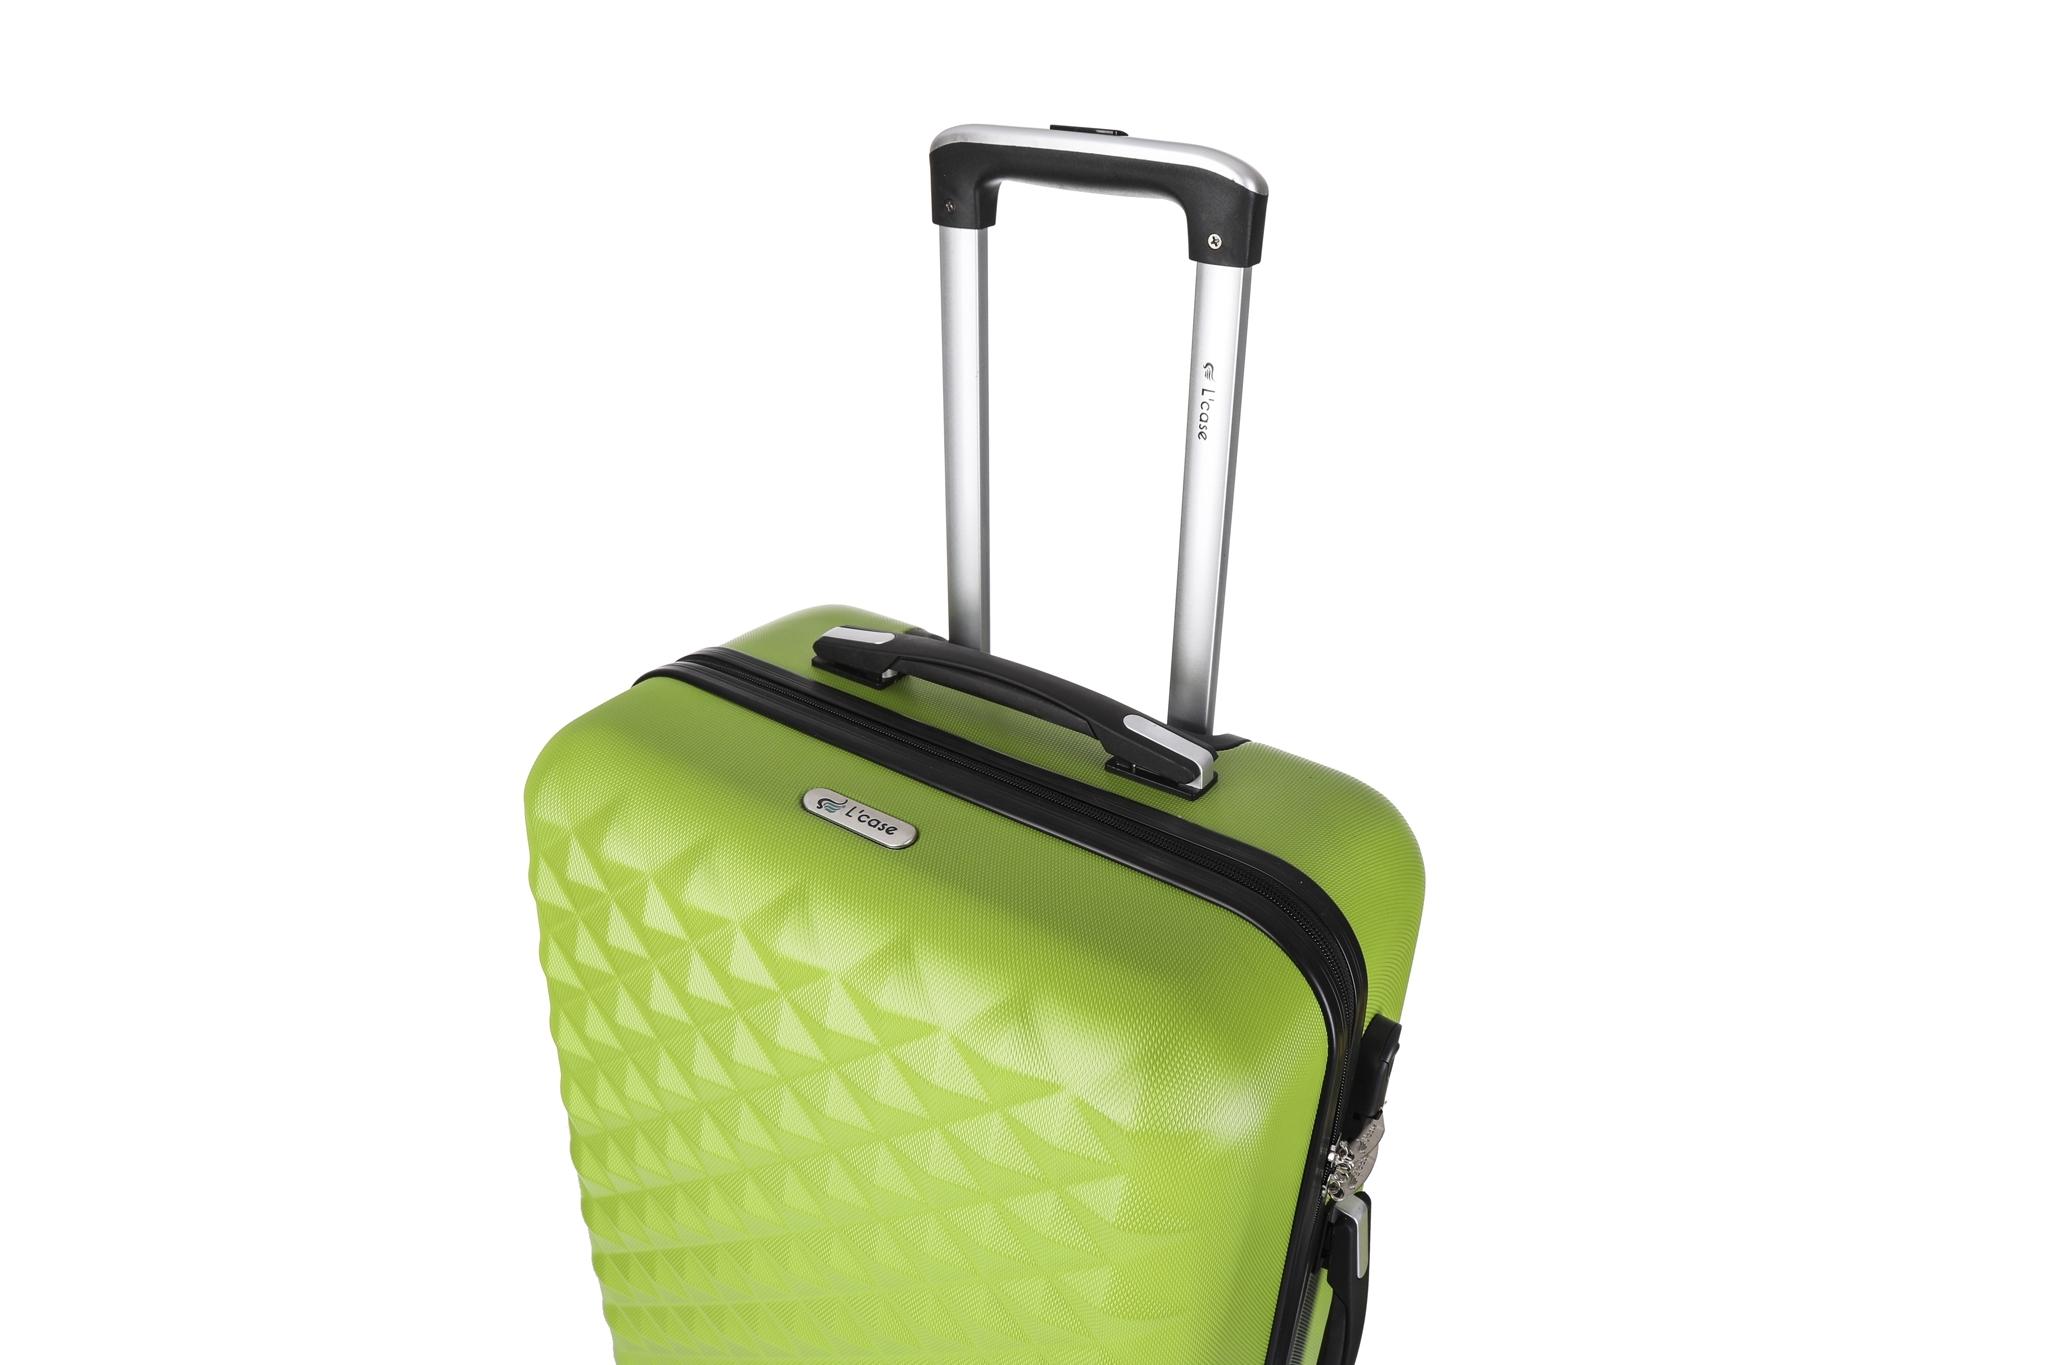 Чемодан со съемными колесами L'case Phatthaya-28 Зеленый (L)